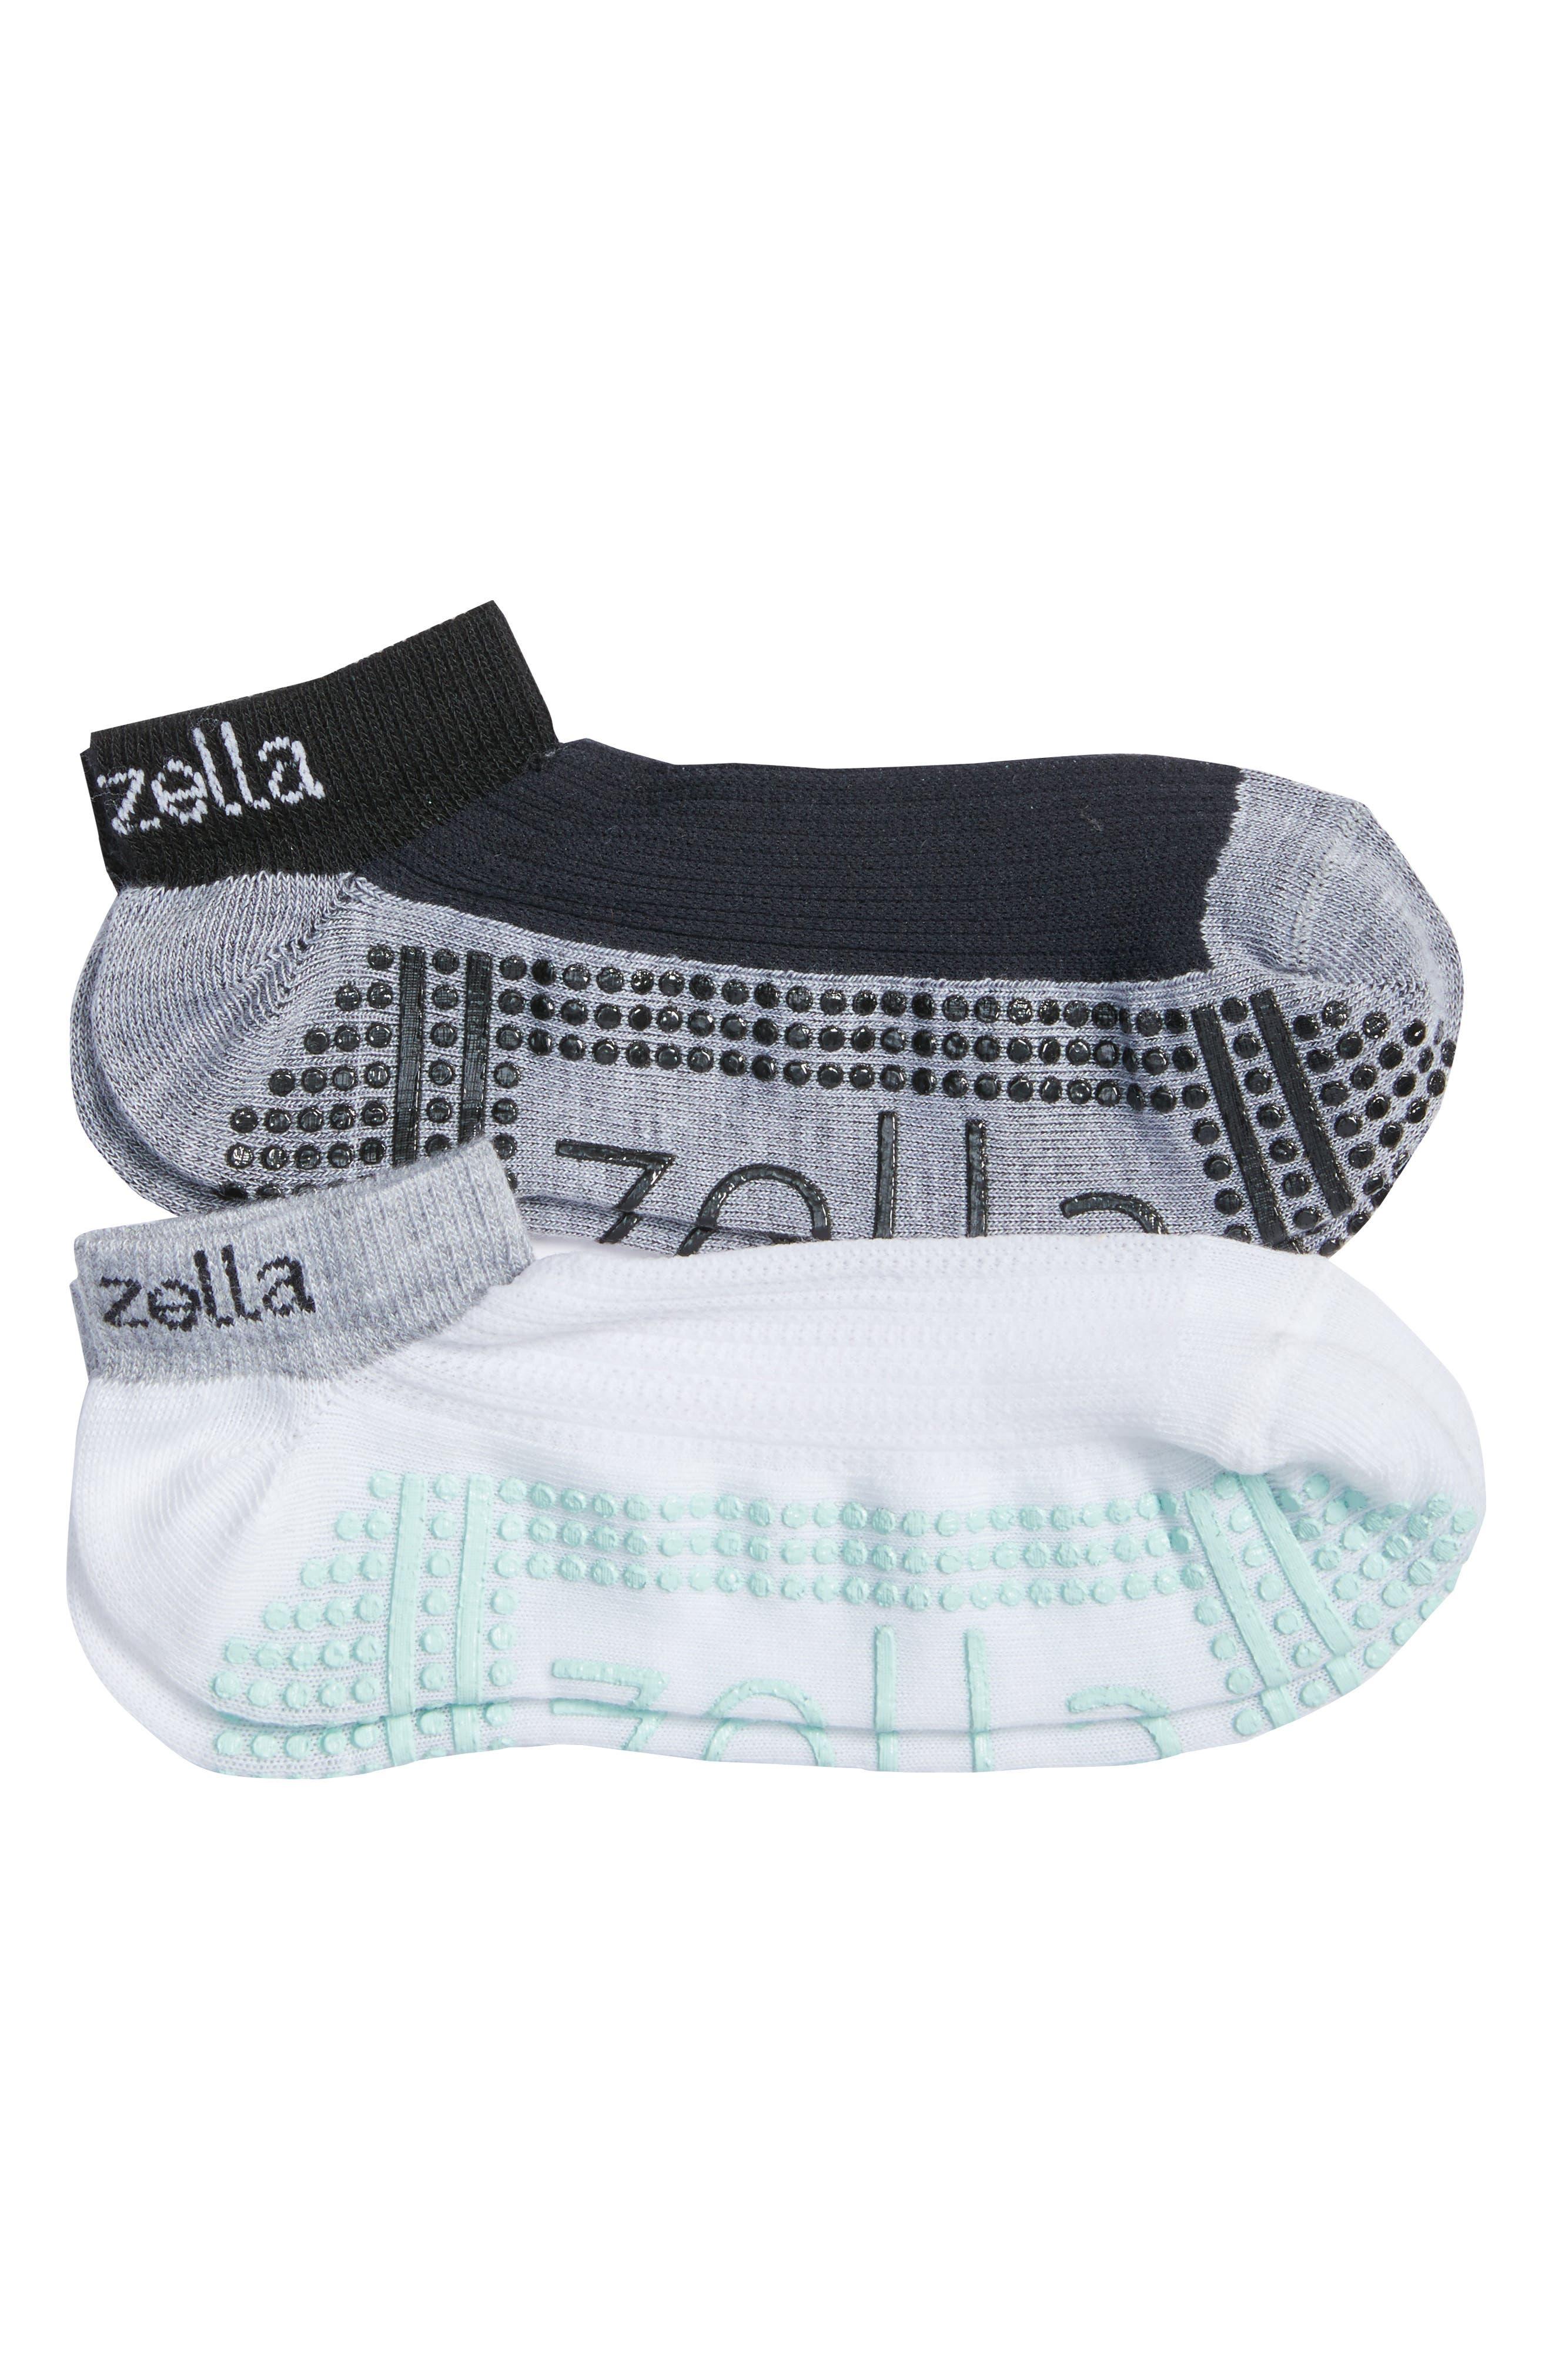 2-Pack Studio Ankle Socks,                         Main,                         color, 025